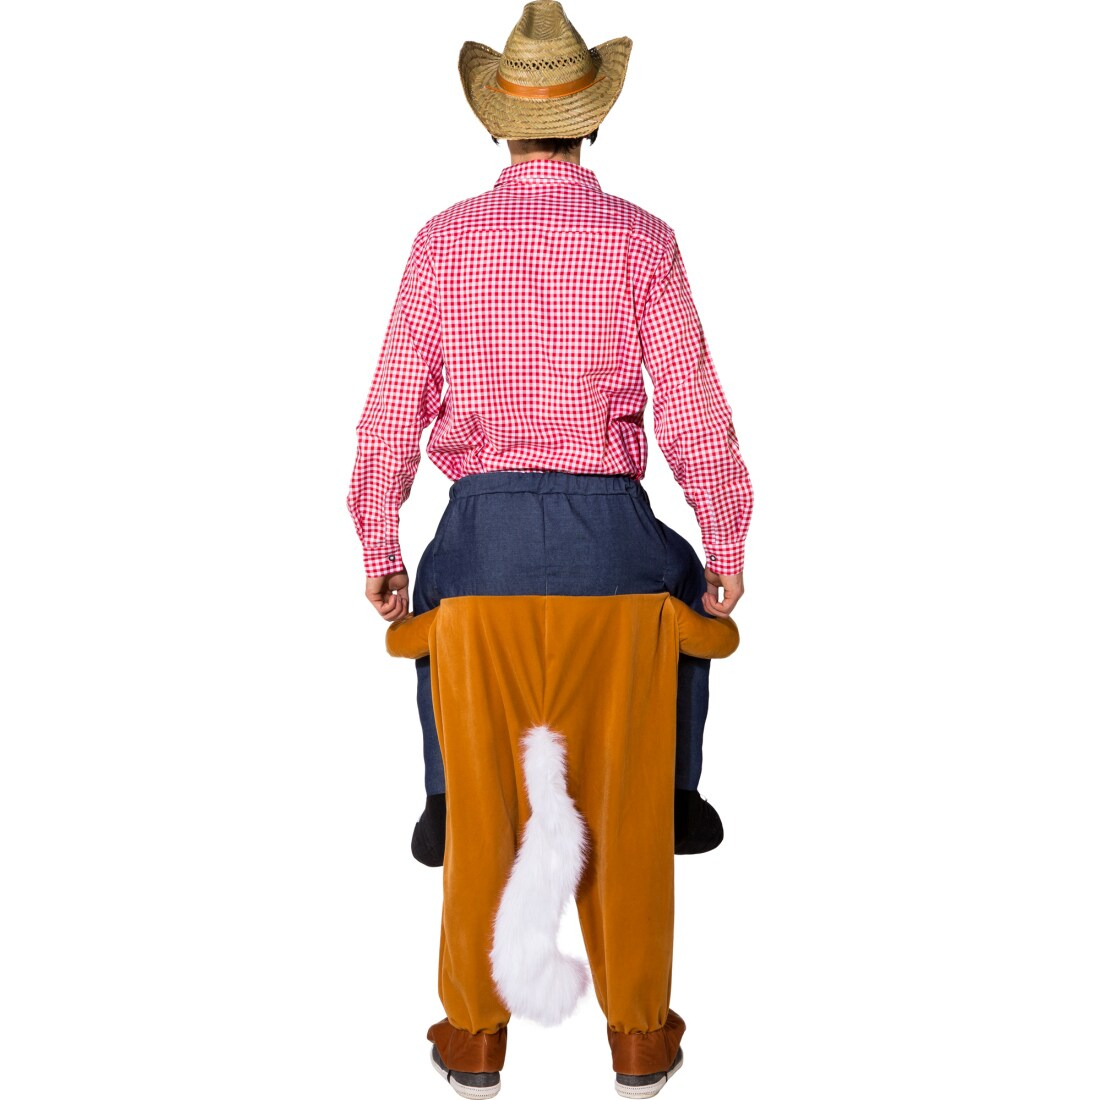 huckepack kost m pferd trag mich gaul 1 80 1 95m 44 99. Black Bedroom Furniture Sets. Home Design Ideas